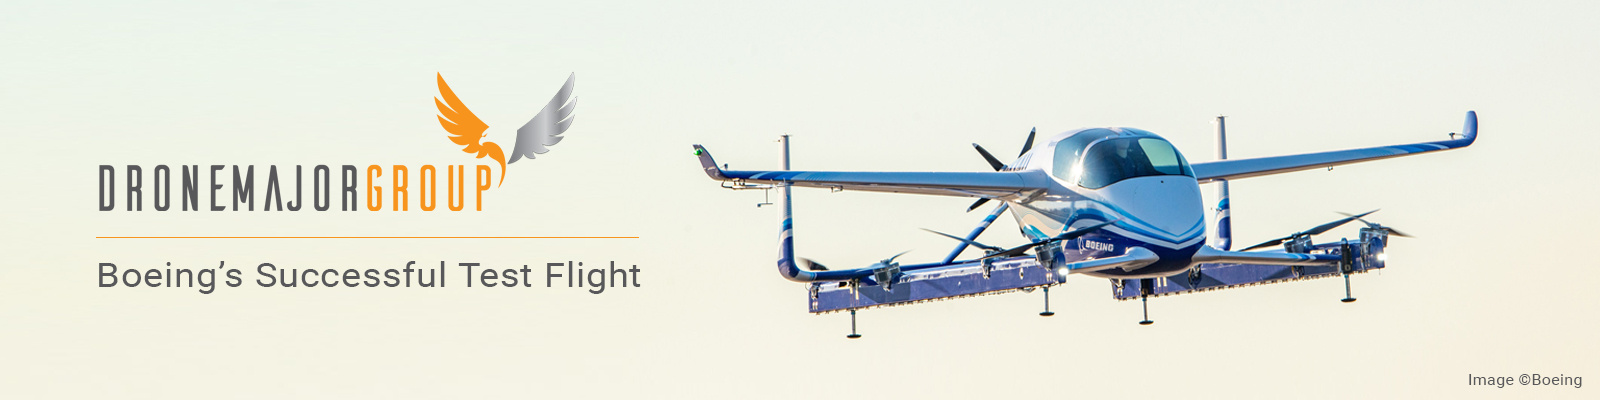 eVTOL Milestone: Boeing's Successful Test Flight